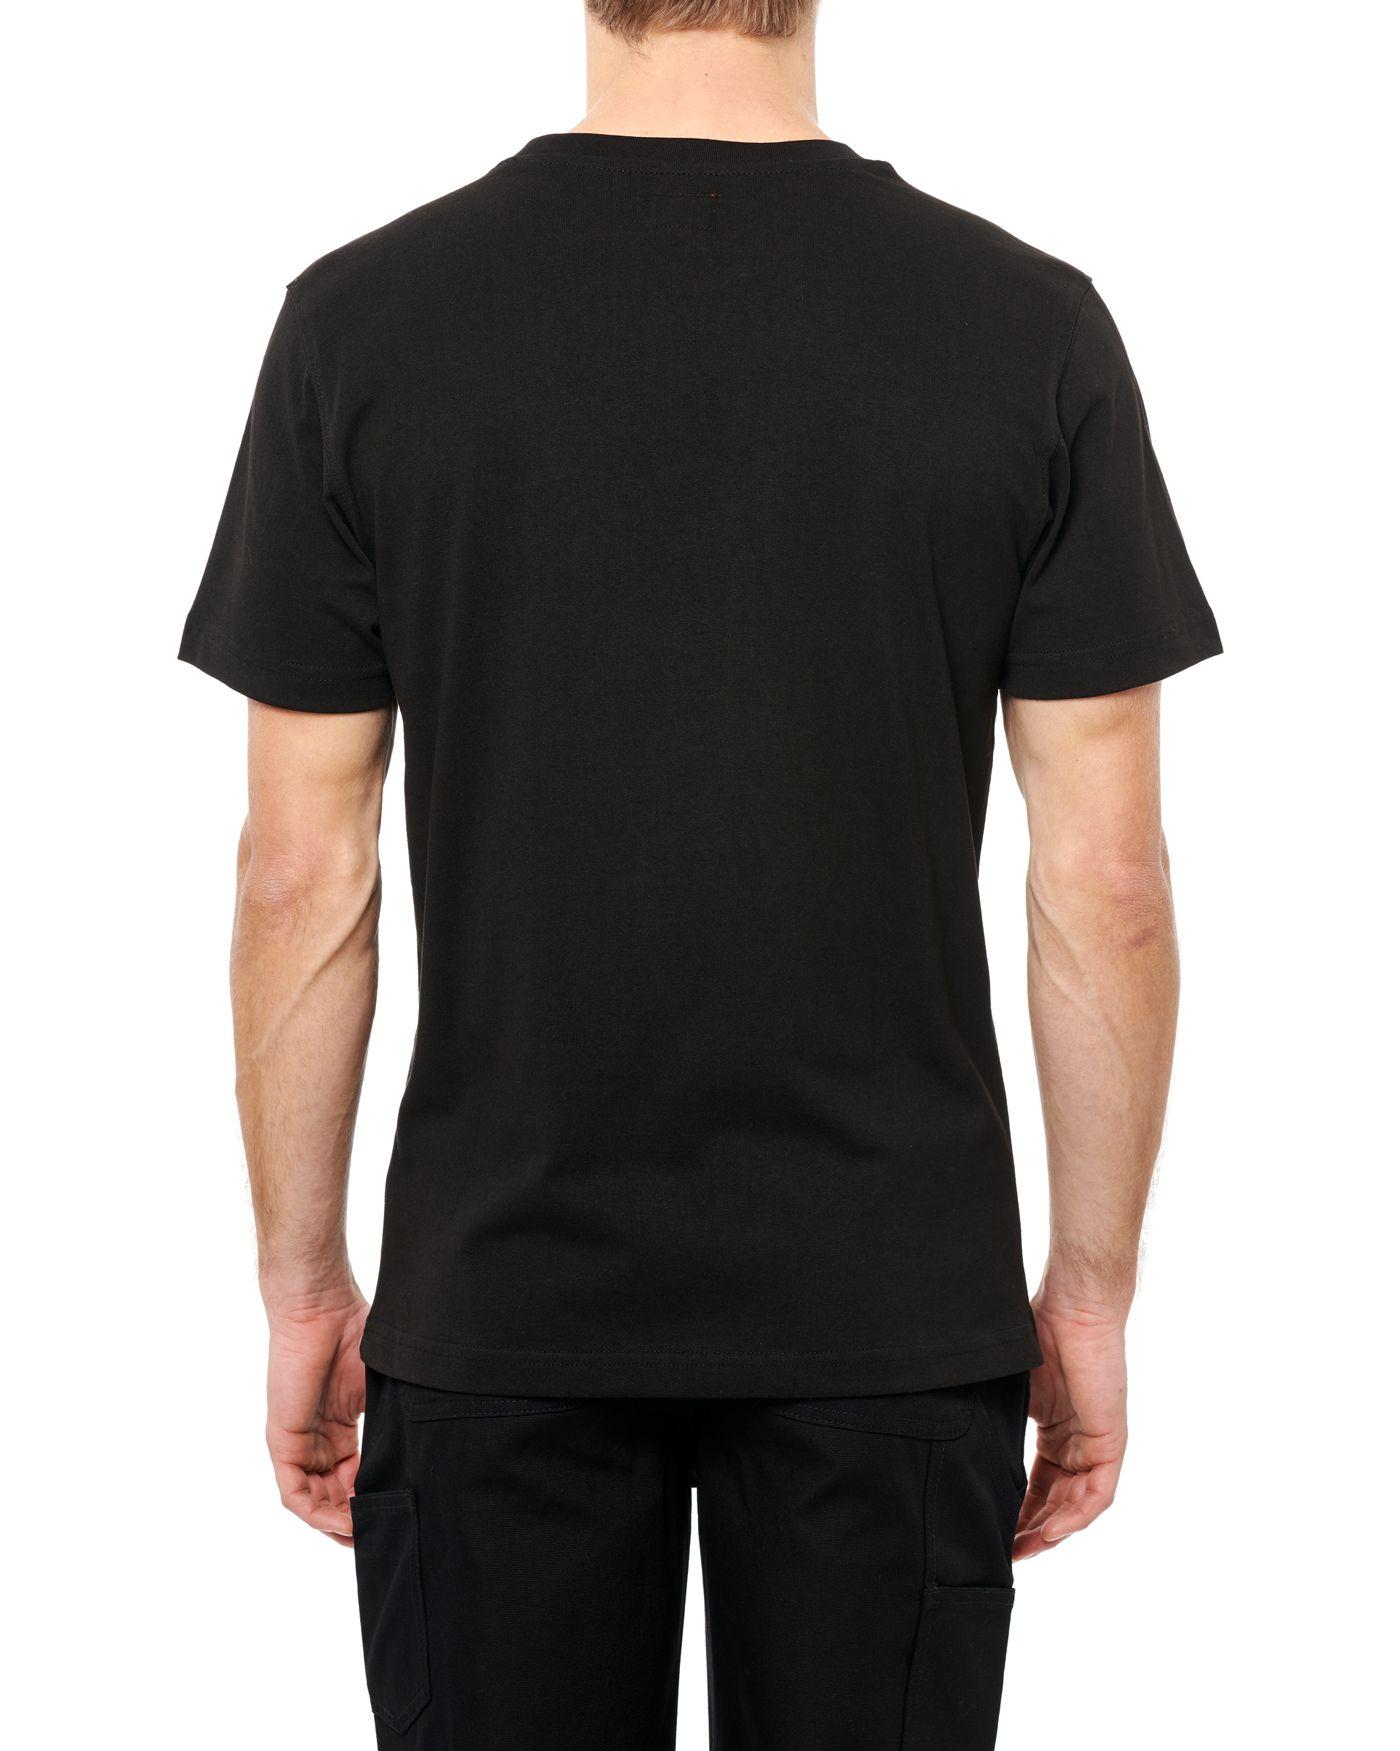 Photo of Bob Cat S/S T-shirt, Black